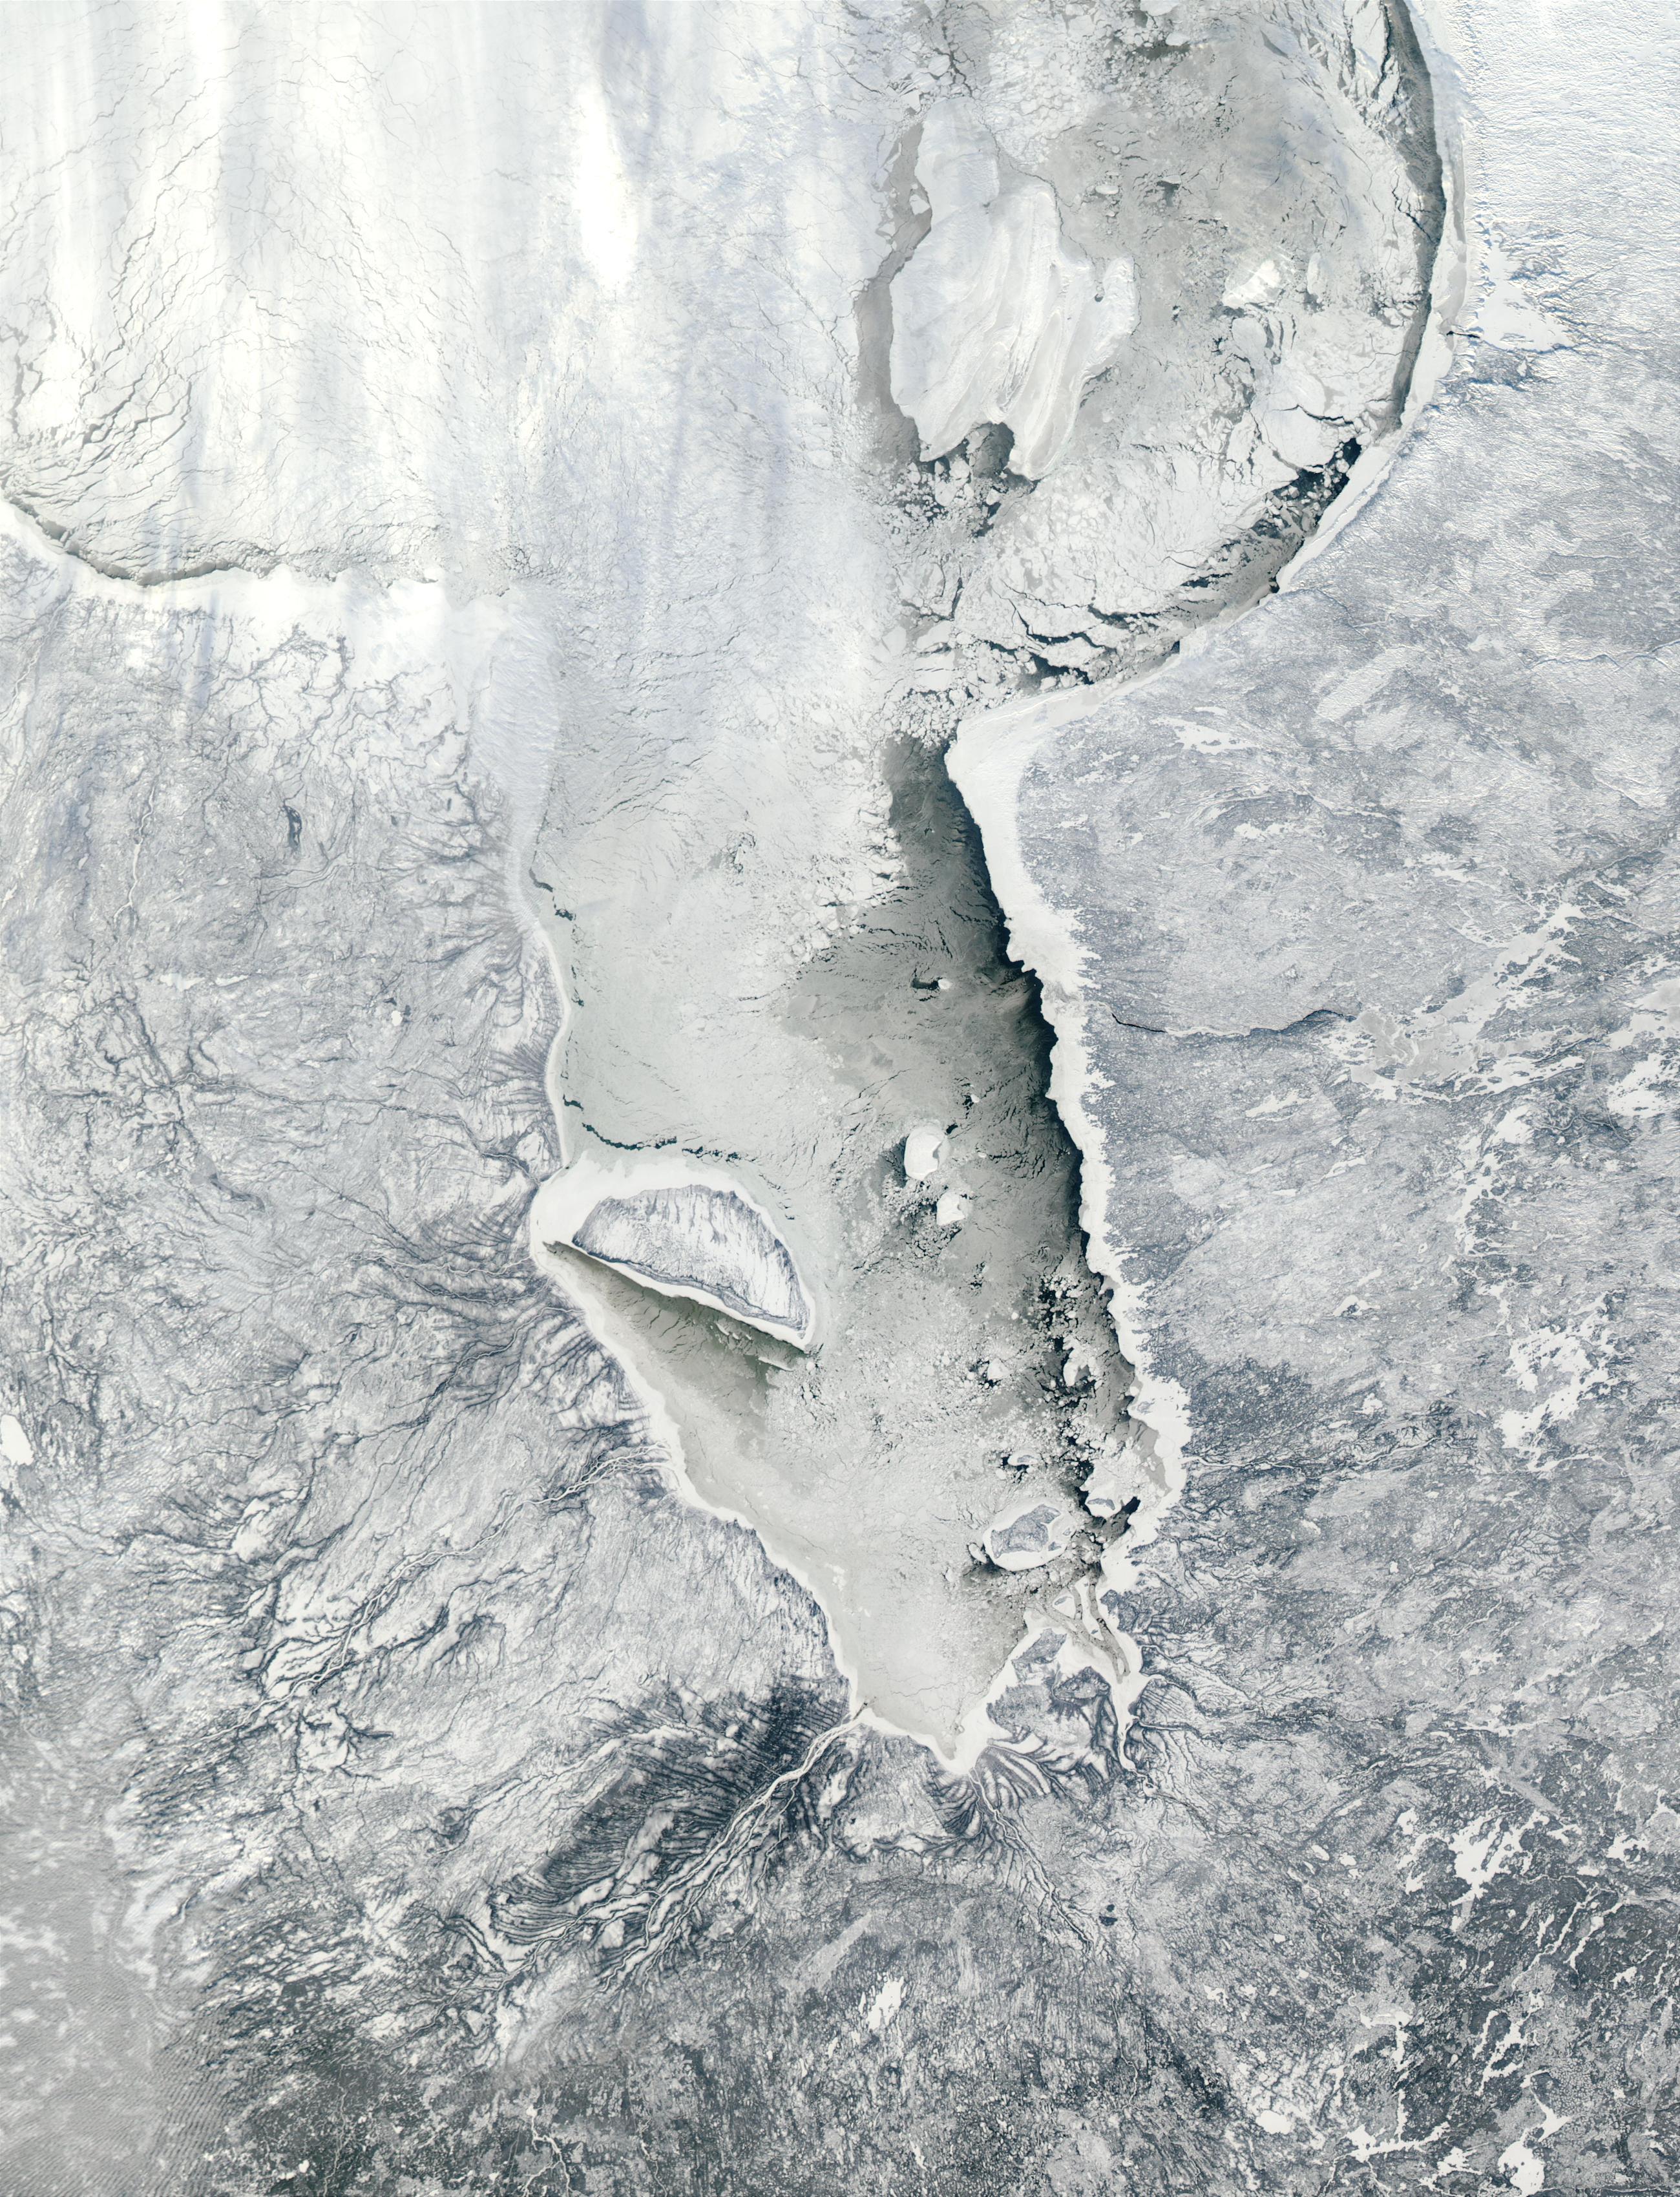 Bahía de James, Canadá